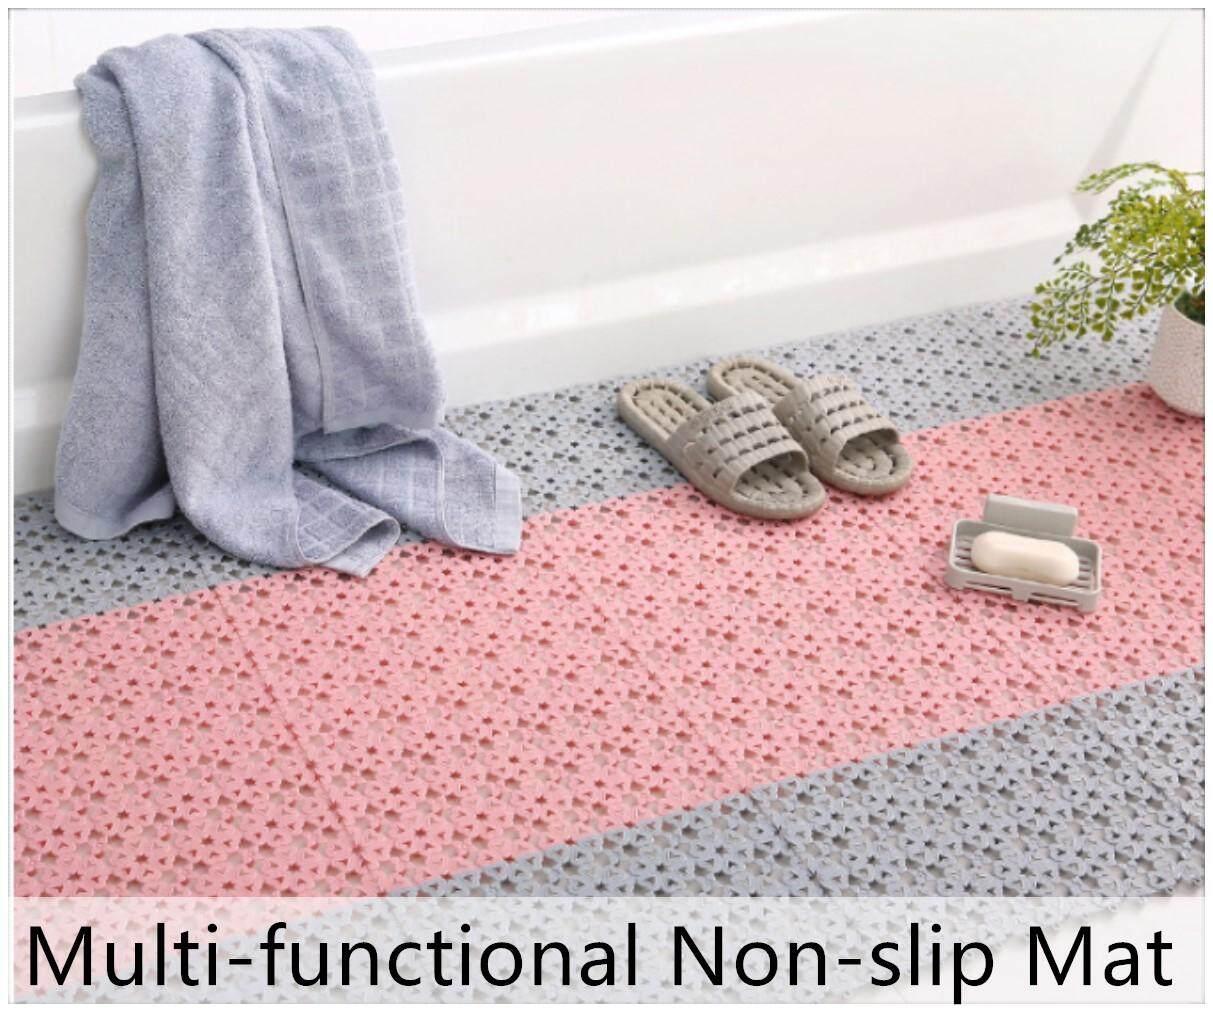 10pcs Floor Mat Non Slip Bathroom Mats Toilet Washroom Pad Rugs Anti Skid Flexible Mat Lazada Singapore